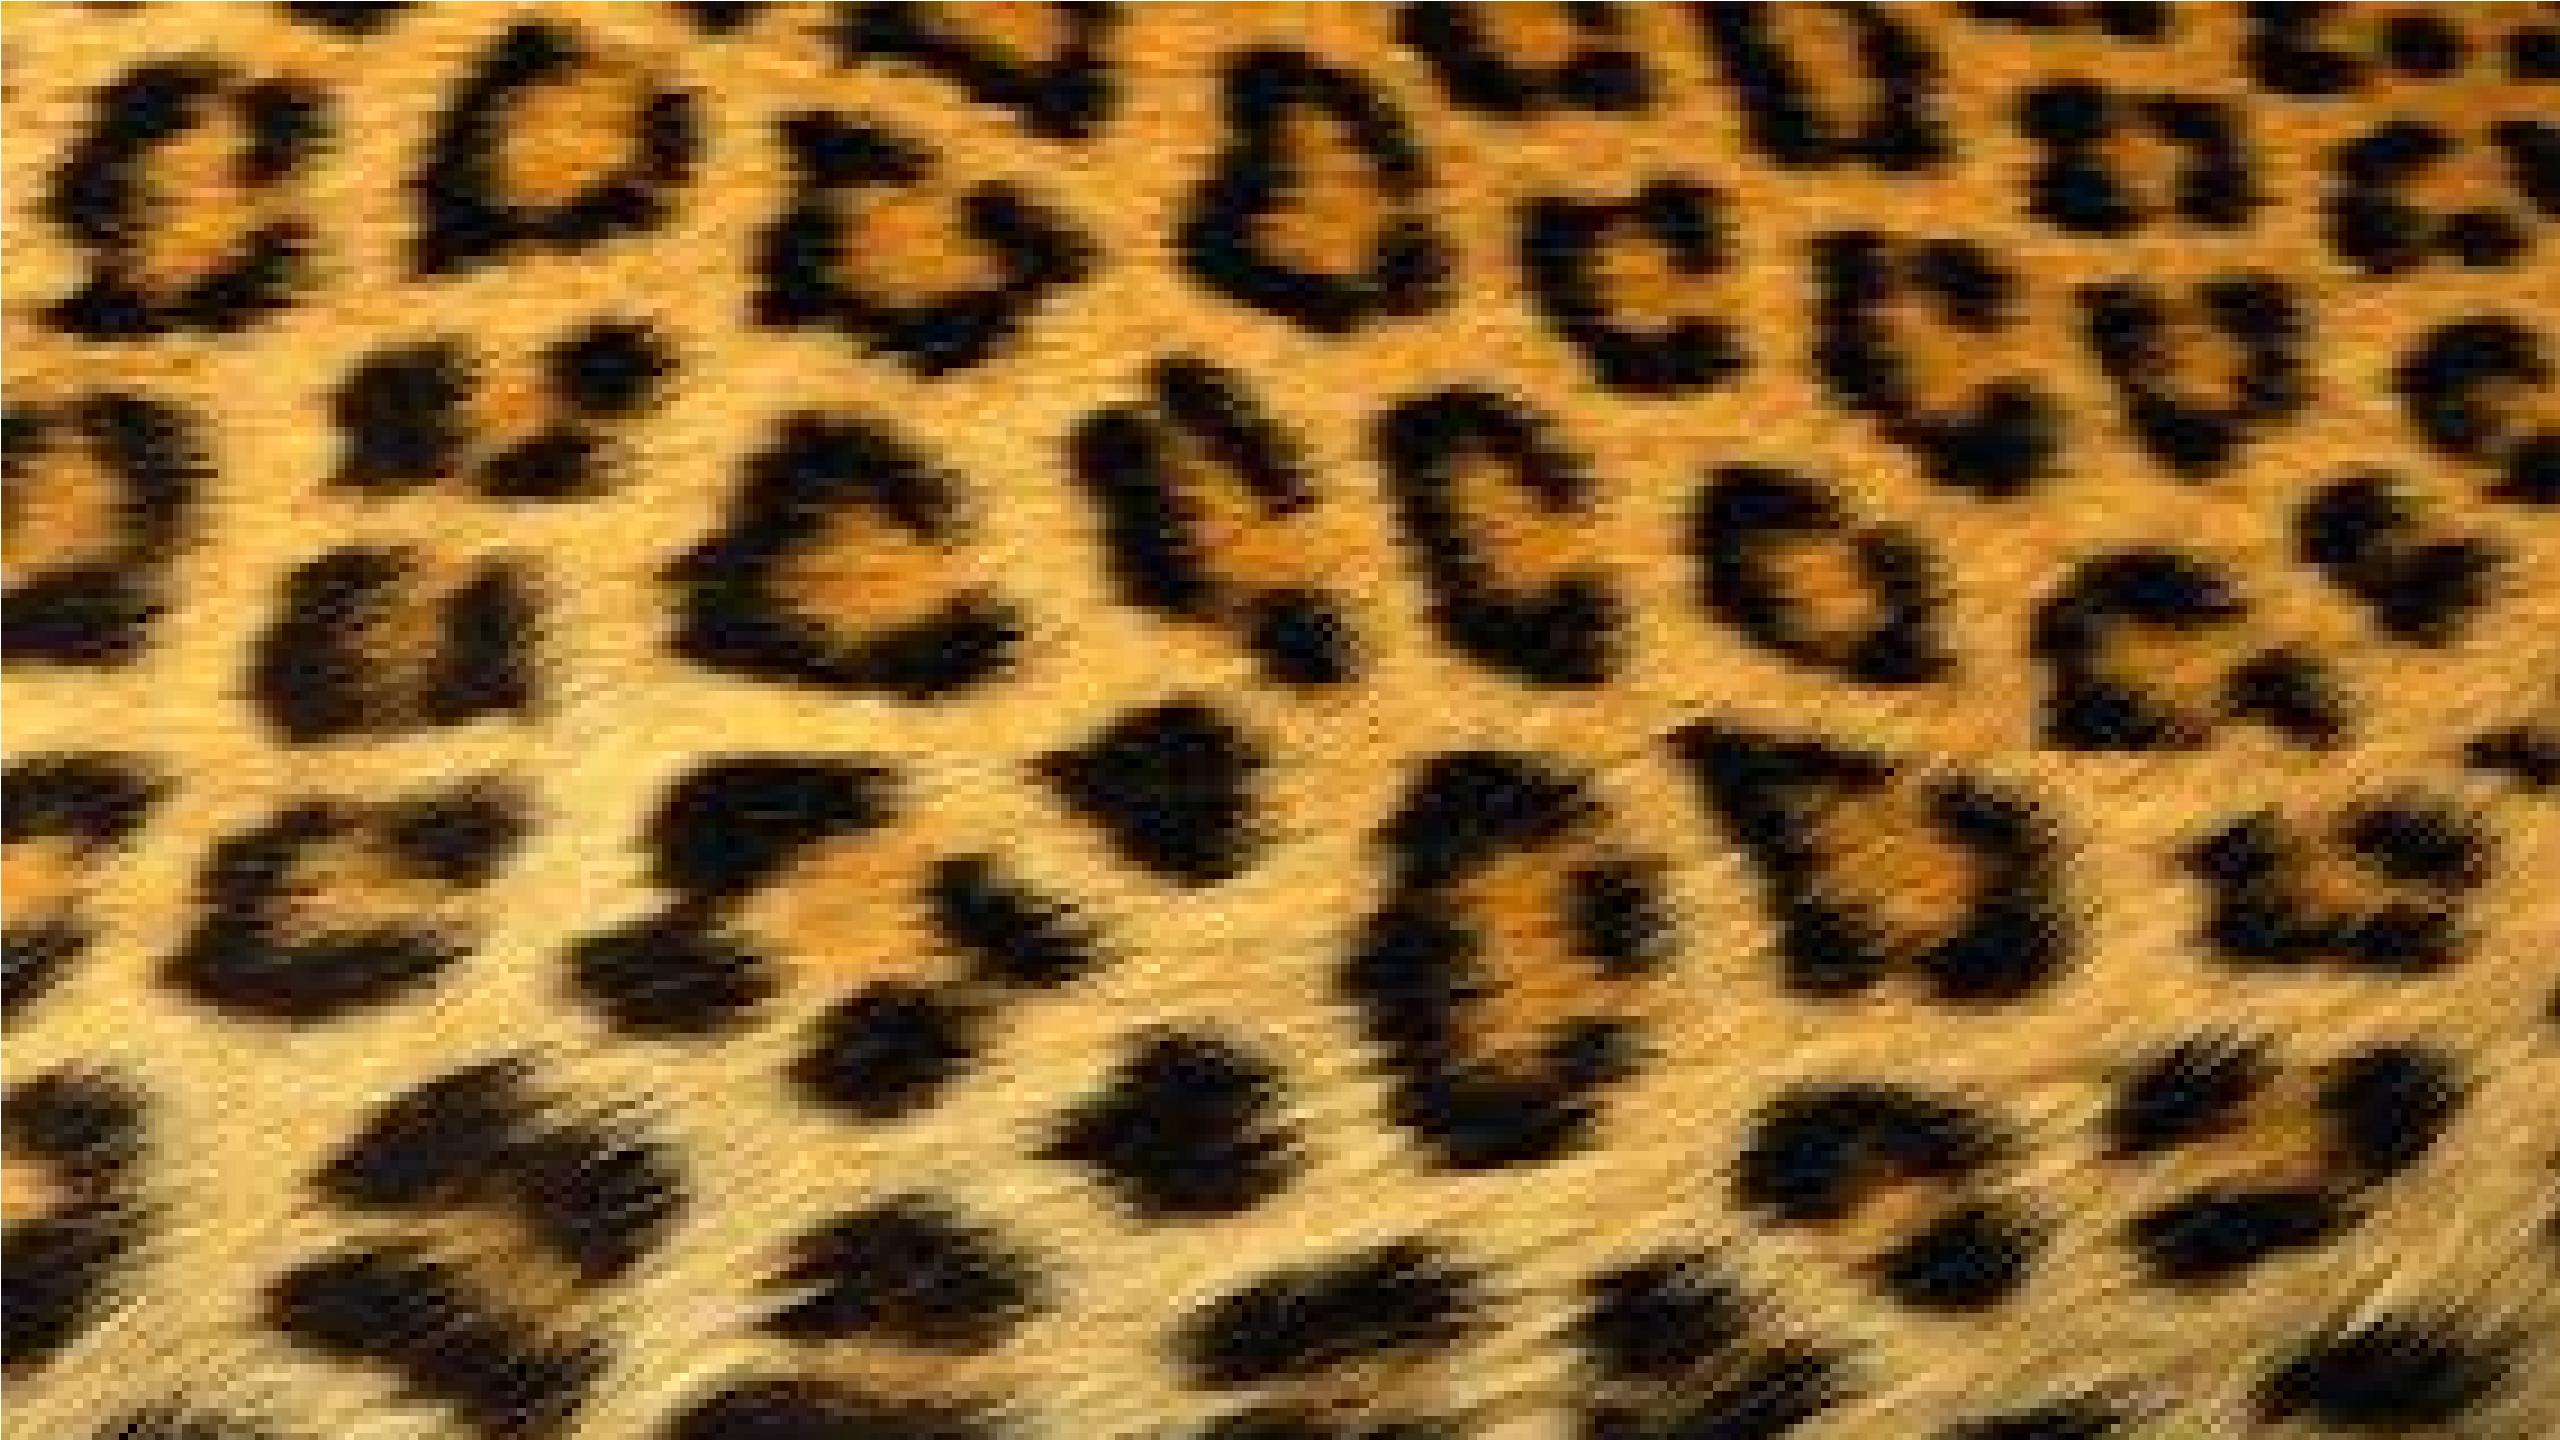 Large Cheetah Fur Wallpaper   Cheetah Wallpaper (37801731)   Fanpop - Animal Fur, Transparent background PNG HD thumbnail